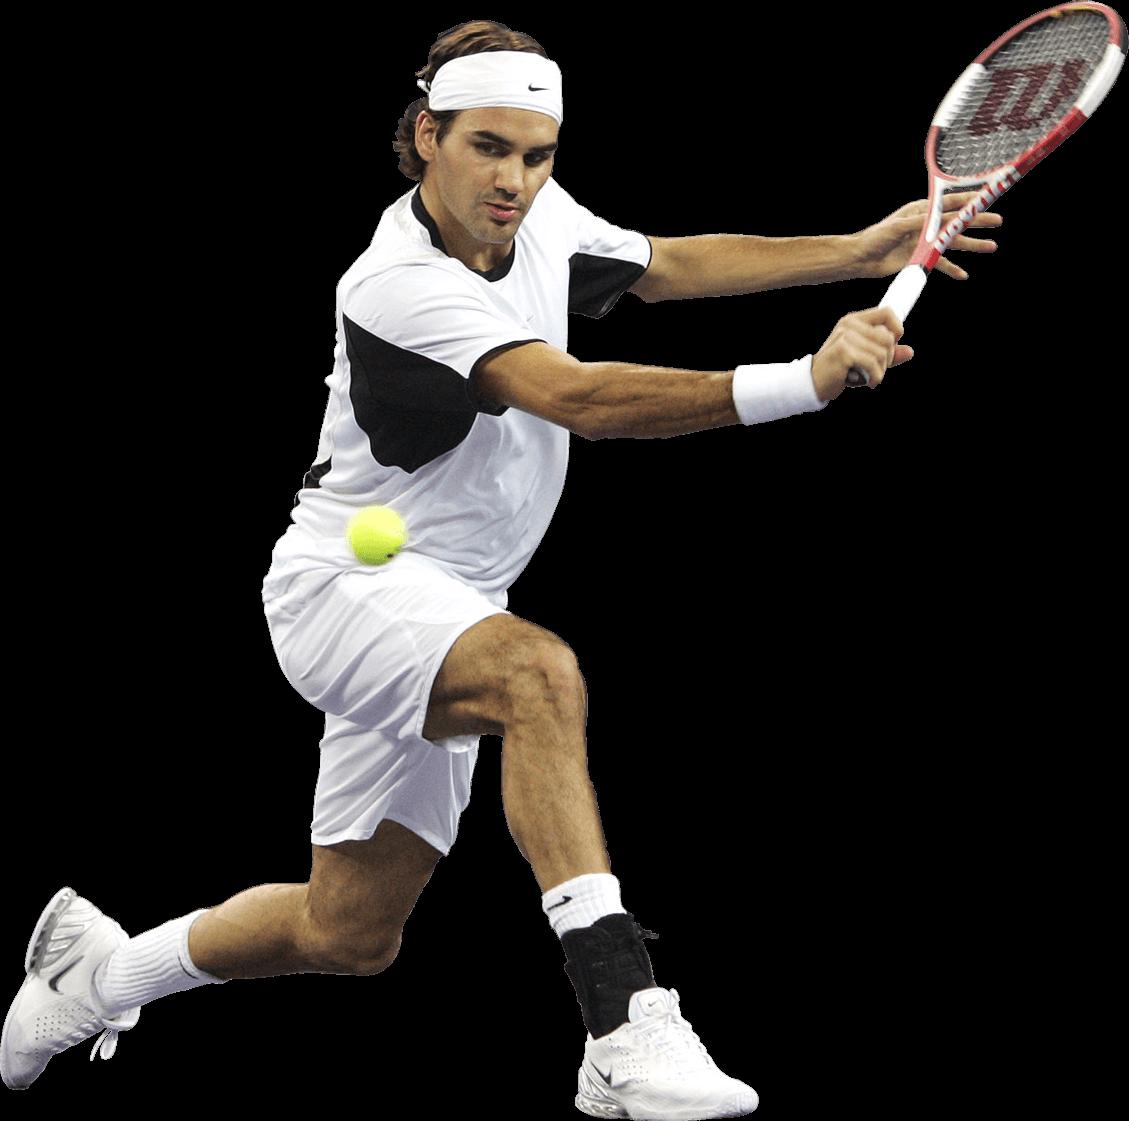 Player man transparent png. Clipart person tennis